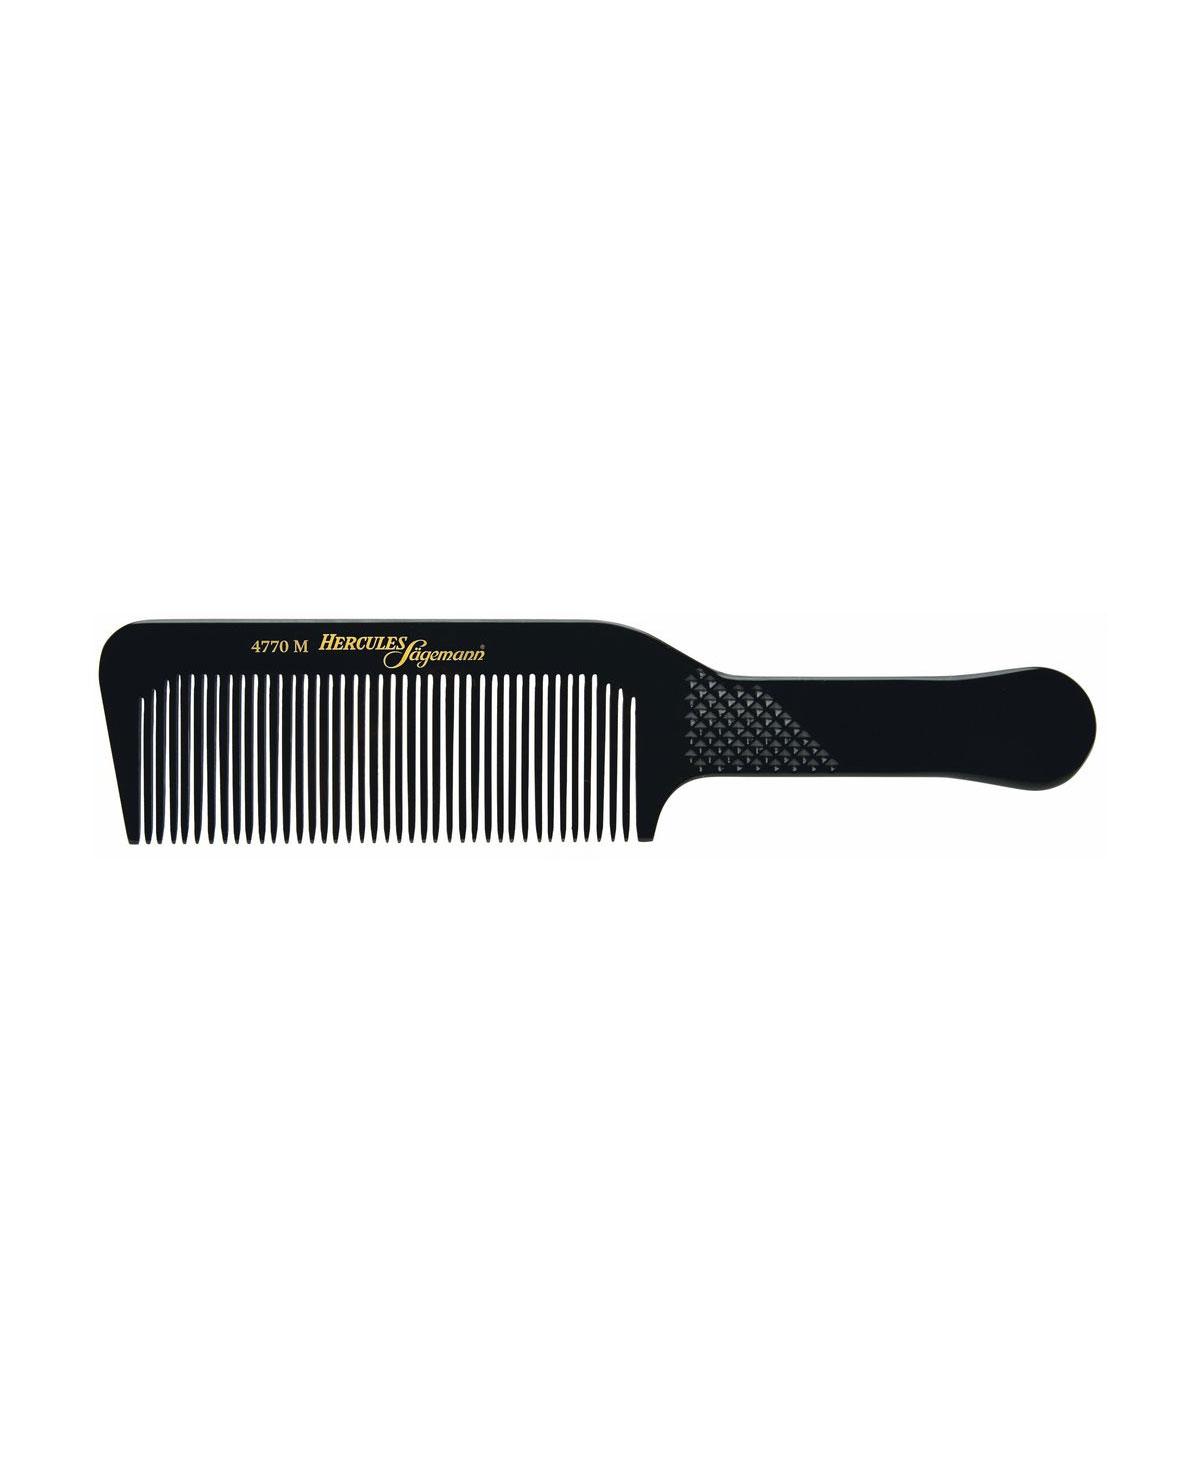 Hercules Haarschneidekamm